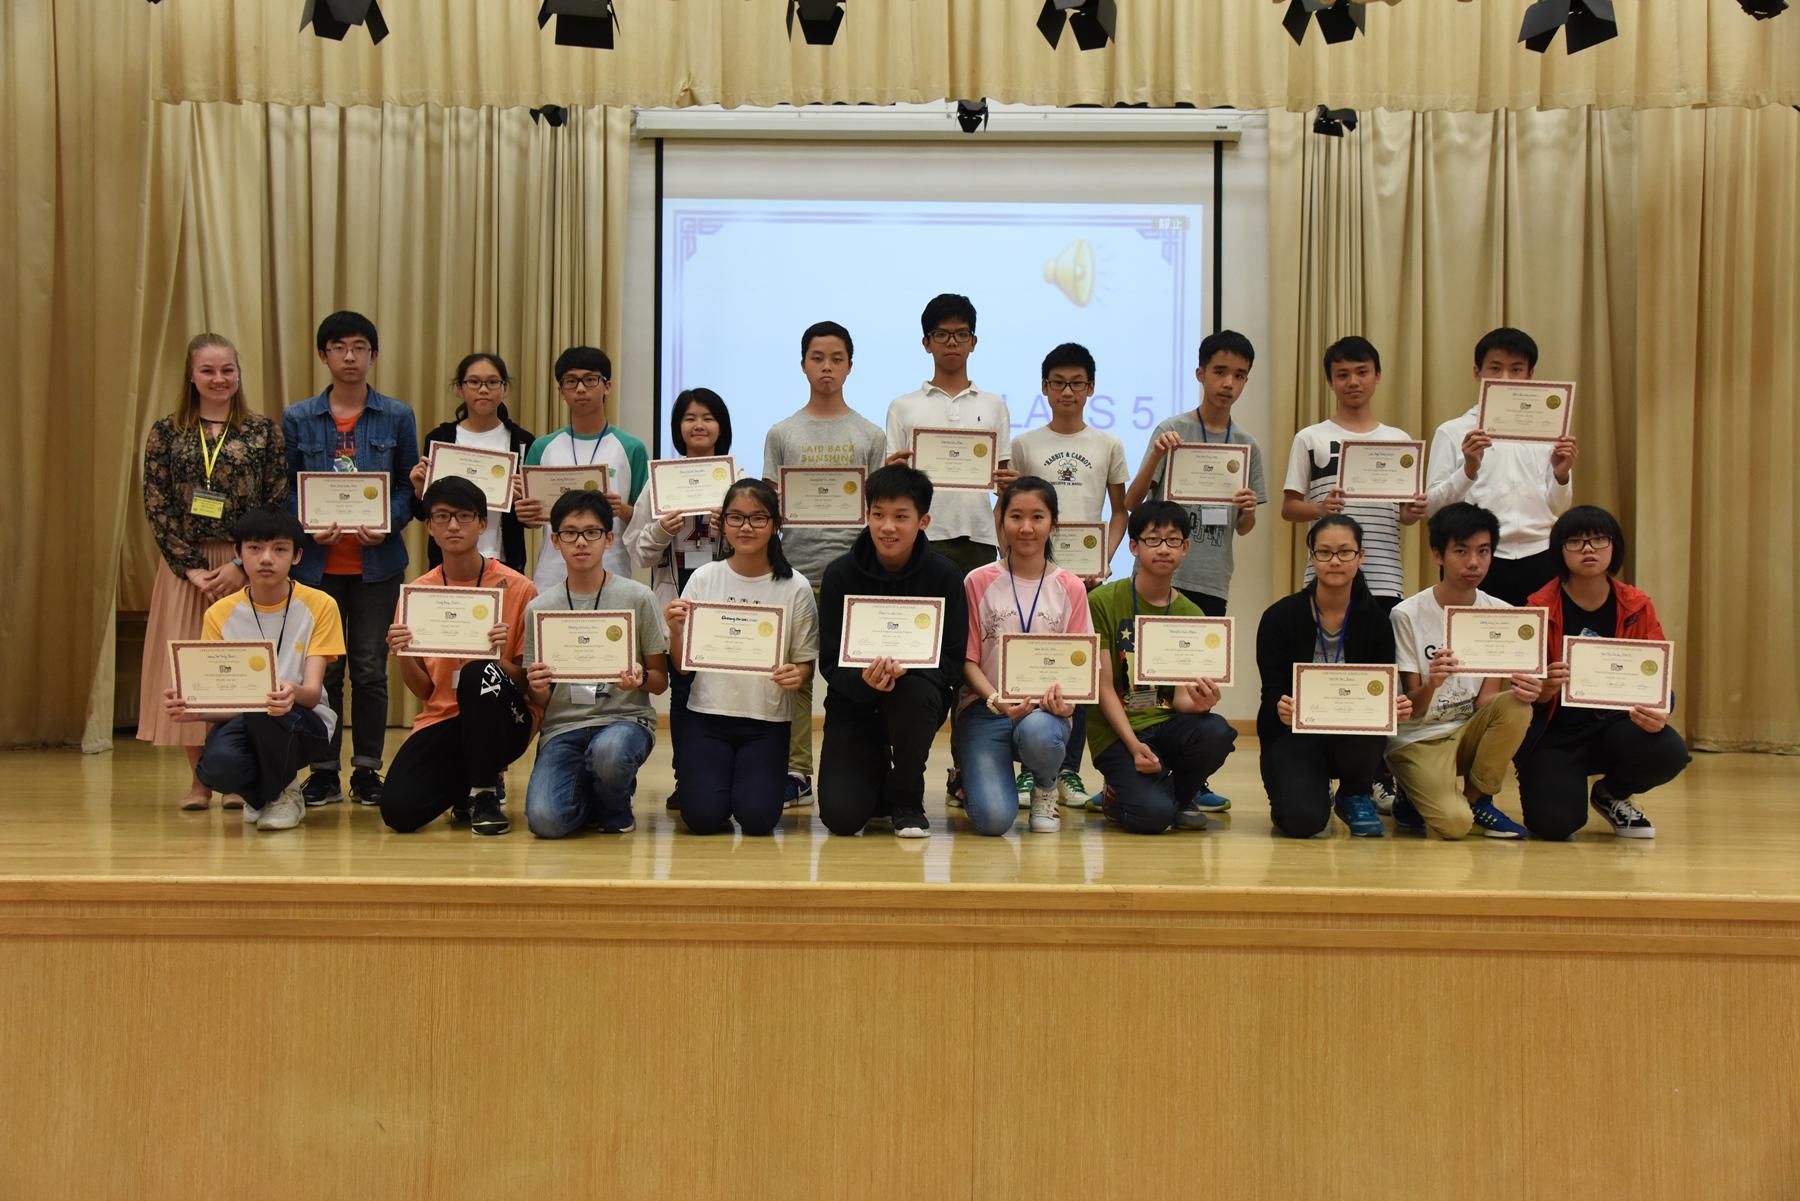 http://www.npc.edu.hk/sites/default/files/dsc_0298.jpg